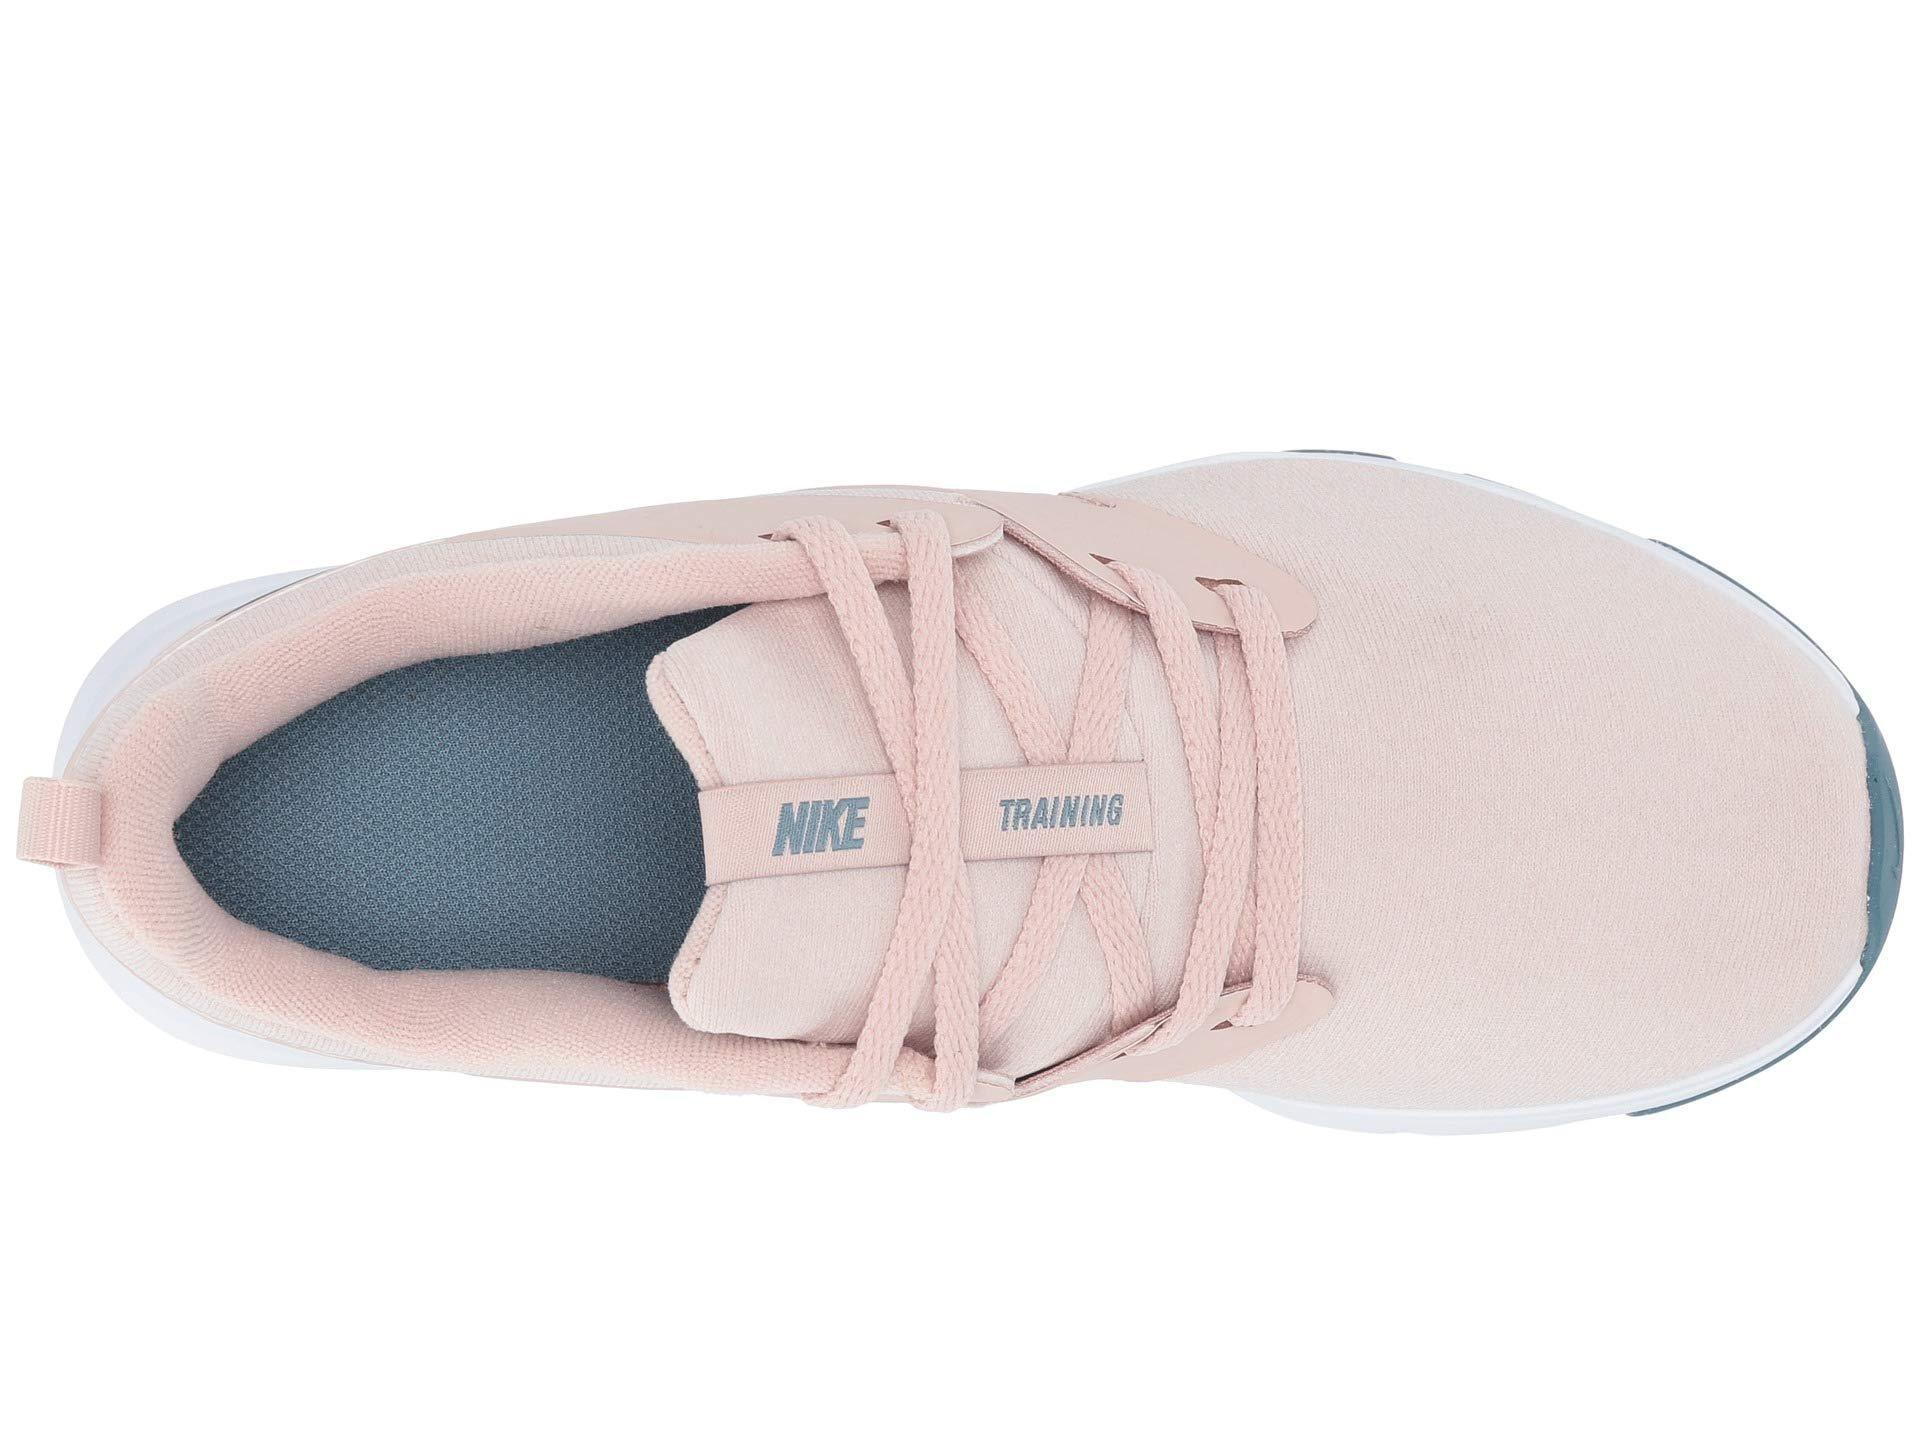 Nike - Pink Air Bella Tr (black white anthracite) Women s Cross Training.  View fullscreen 18d9a7a6b5e3e